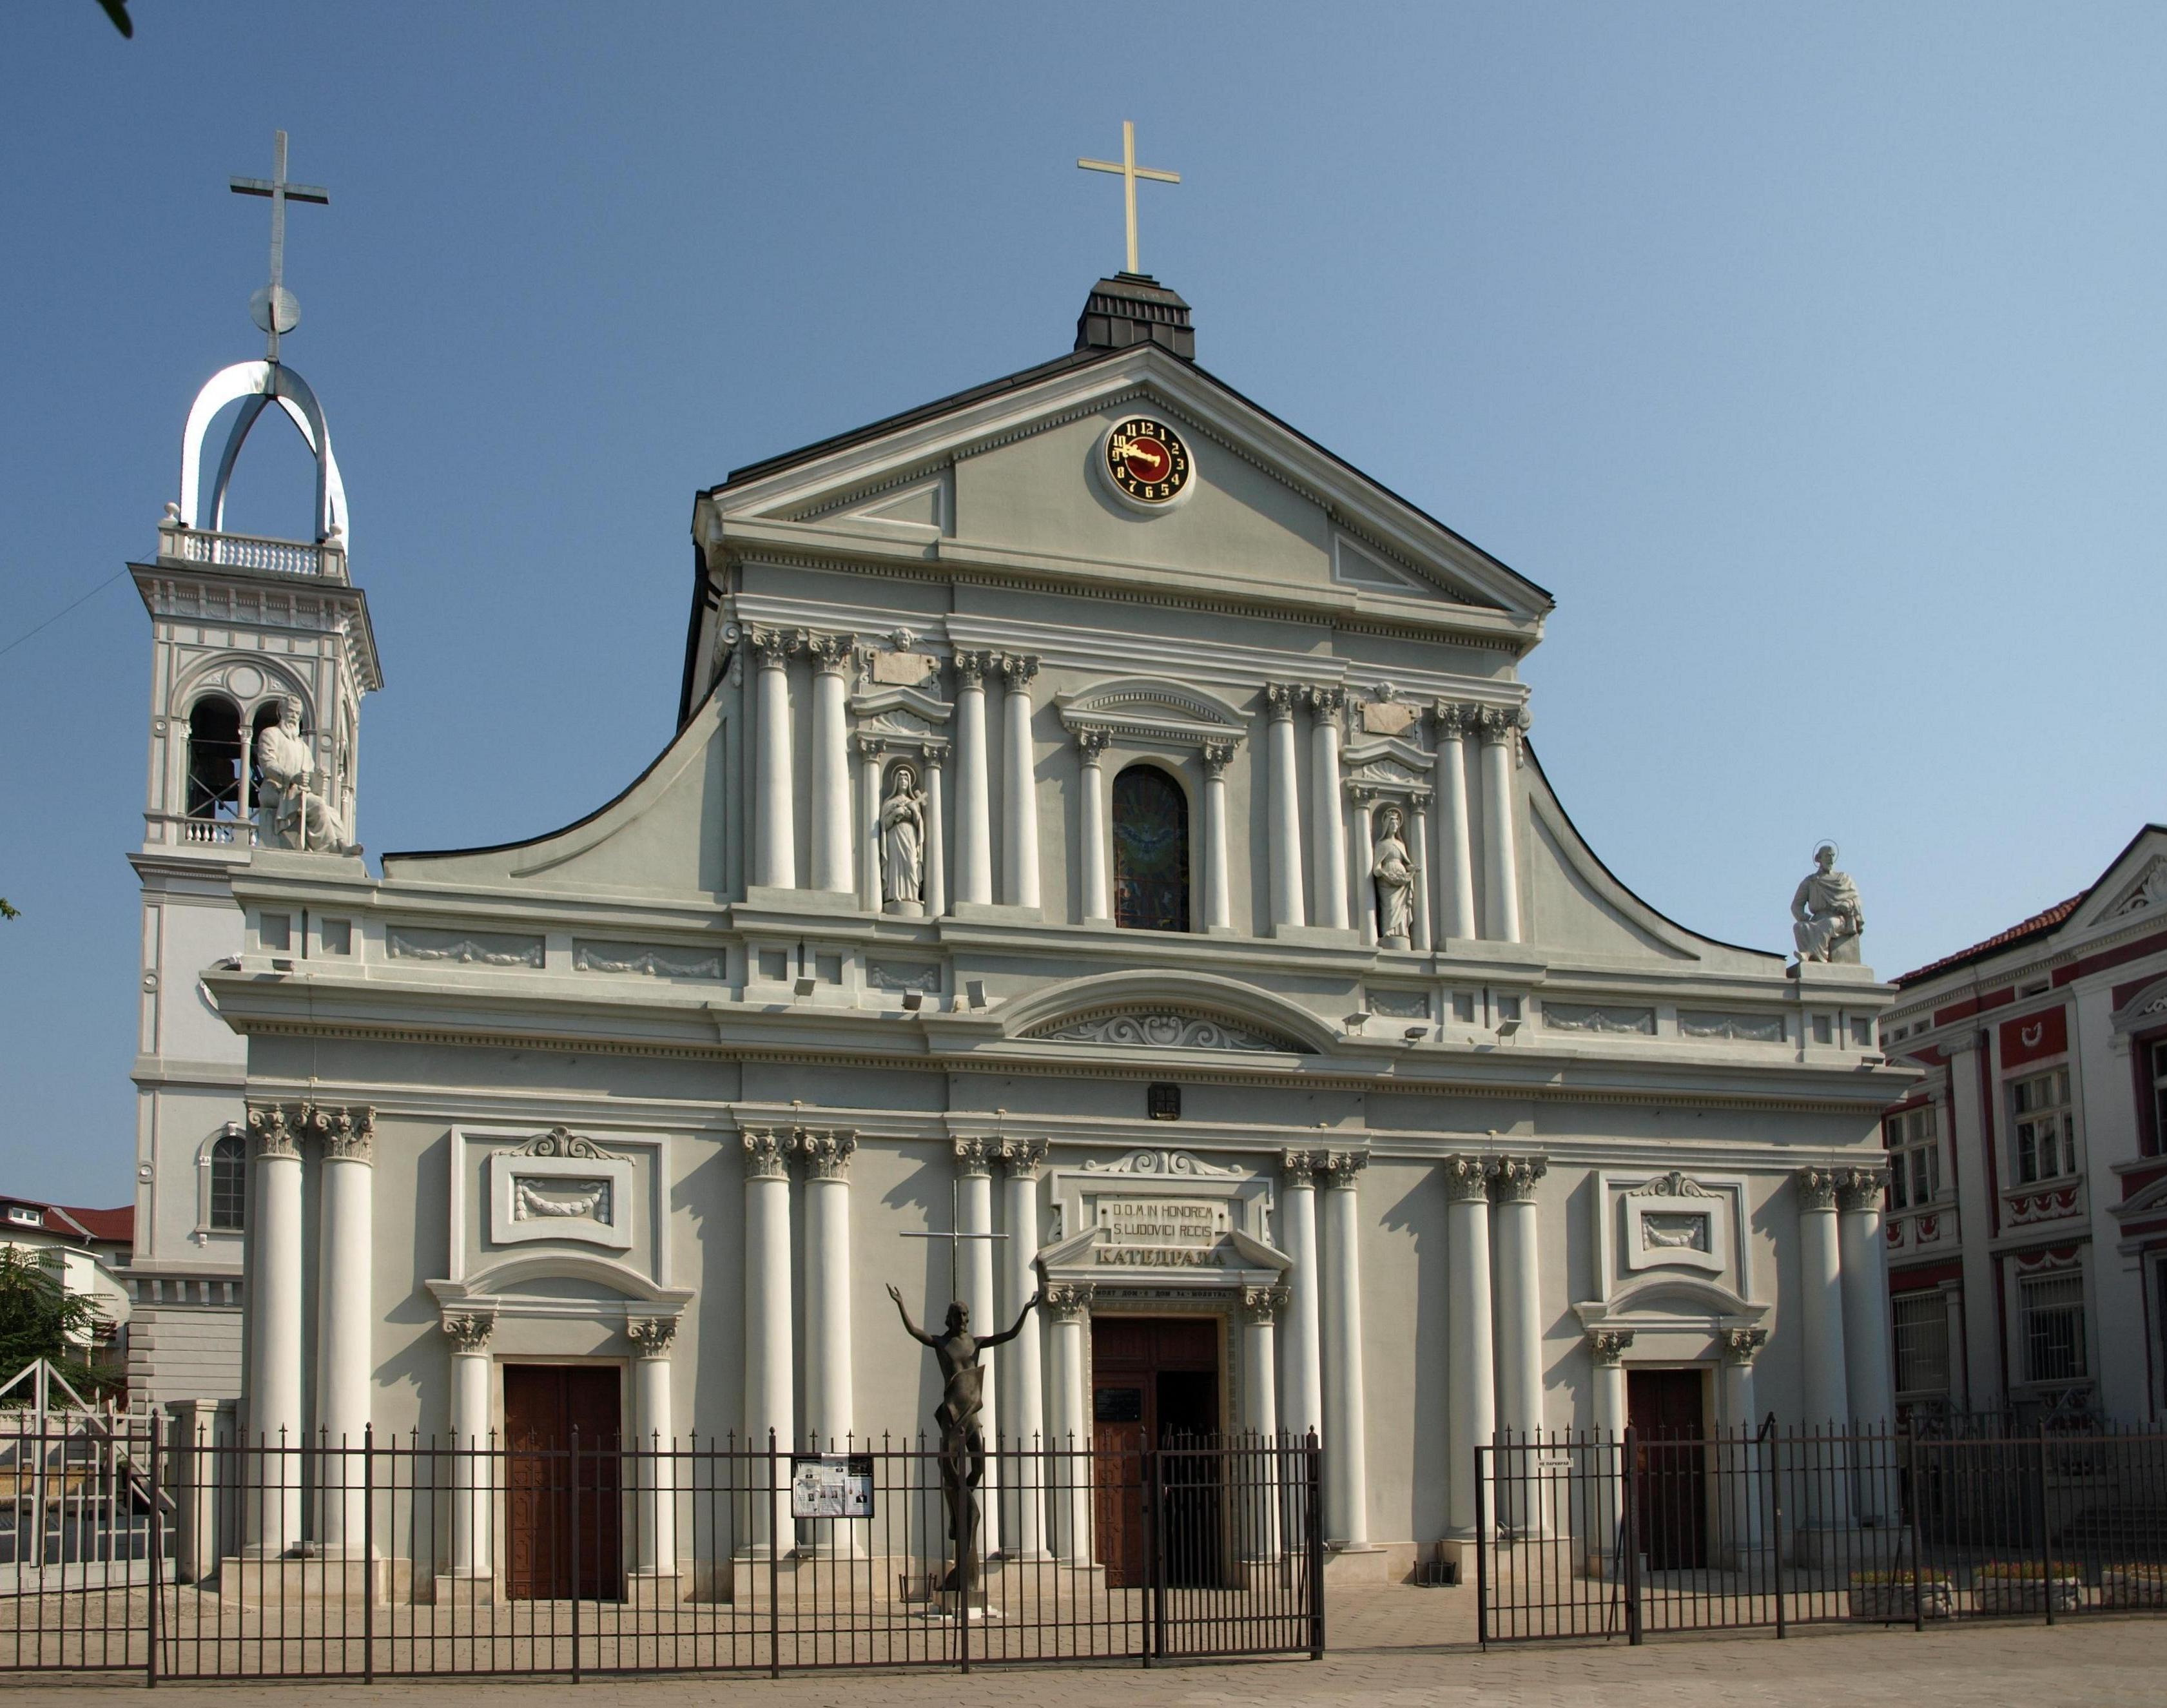 incontri Fast Catholic Luchs di matchmaking